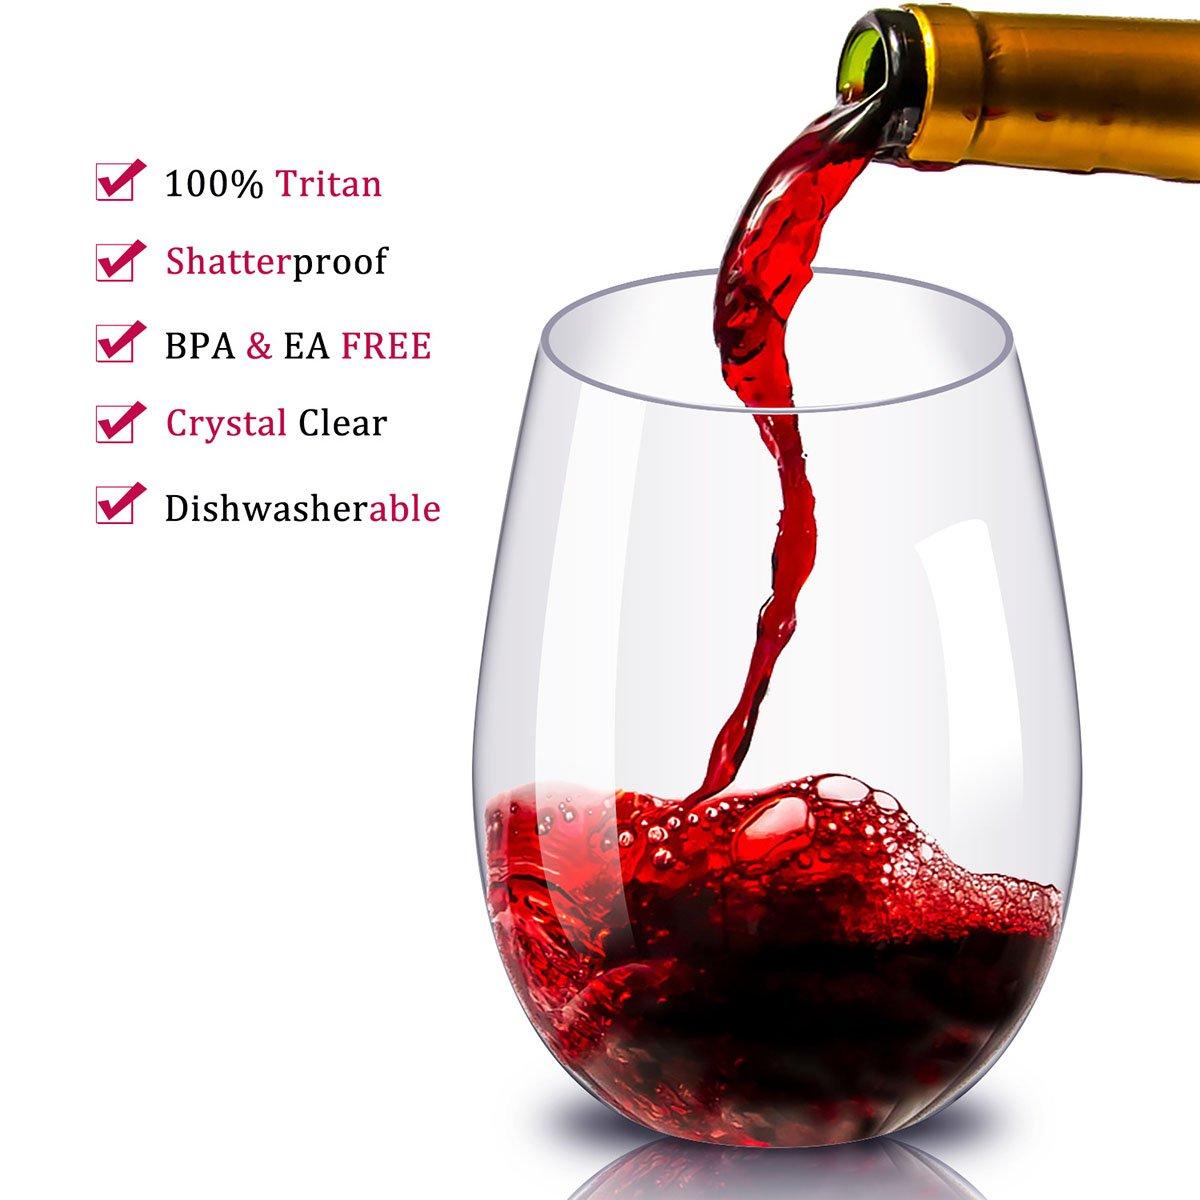 Kuke Unbreakable Red Wine Glasses,100% Tritan Plastic Wine Glasses for Party,BPA Free,Dishwasher Safe,16 oz (450ml)